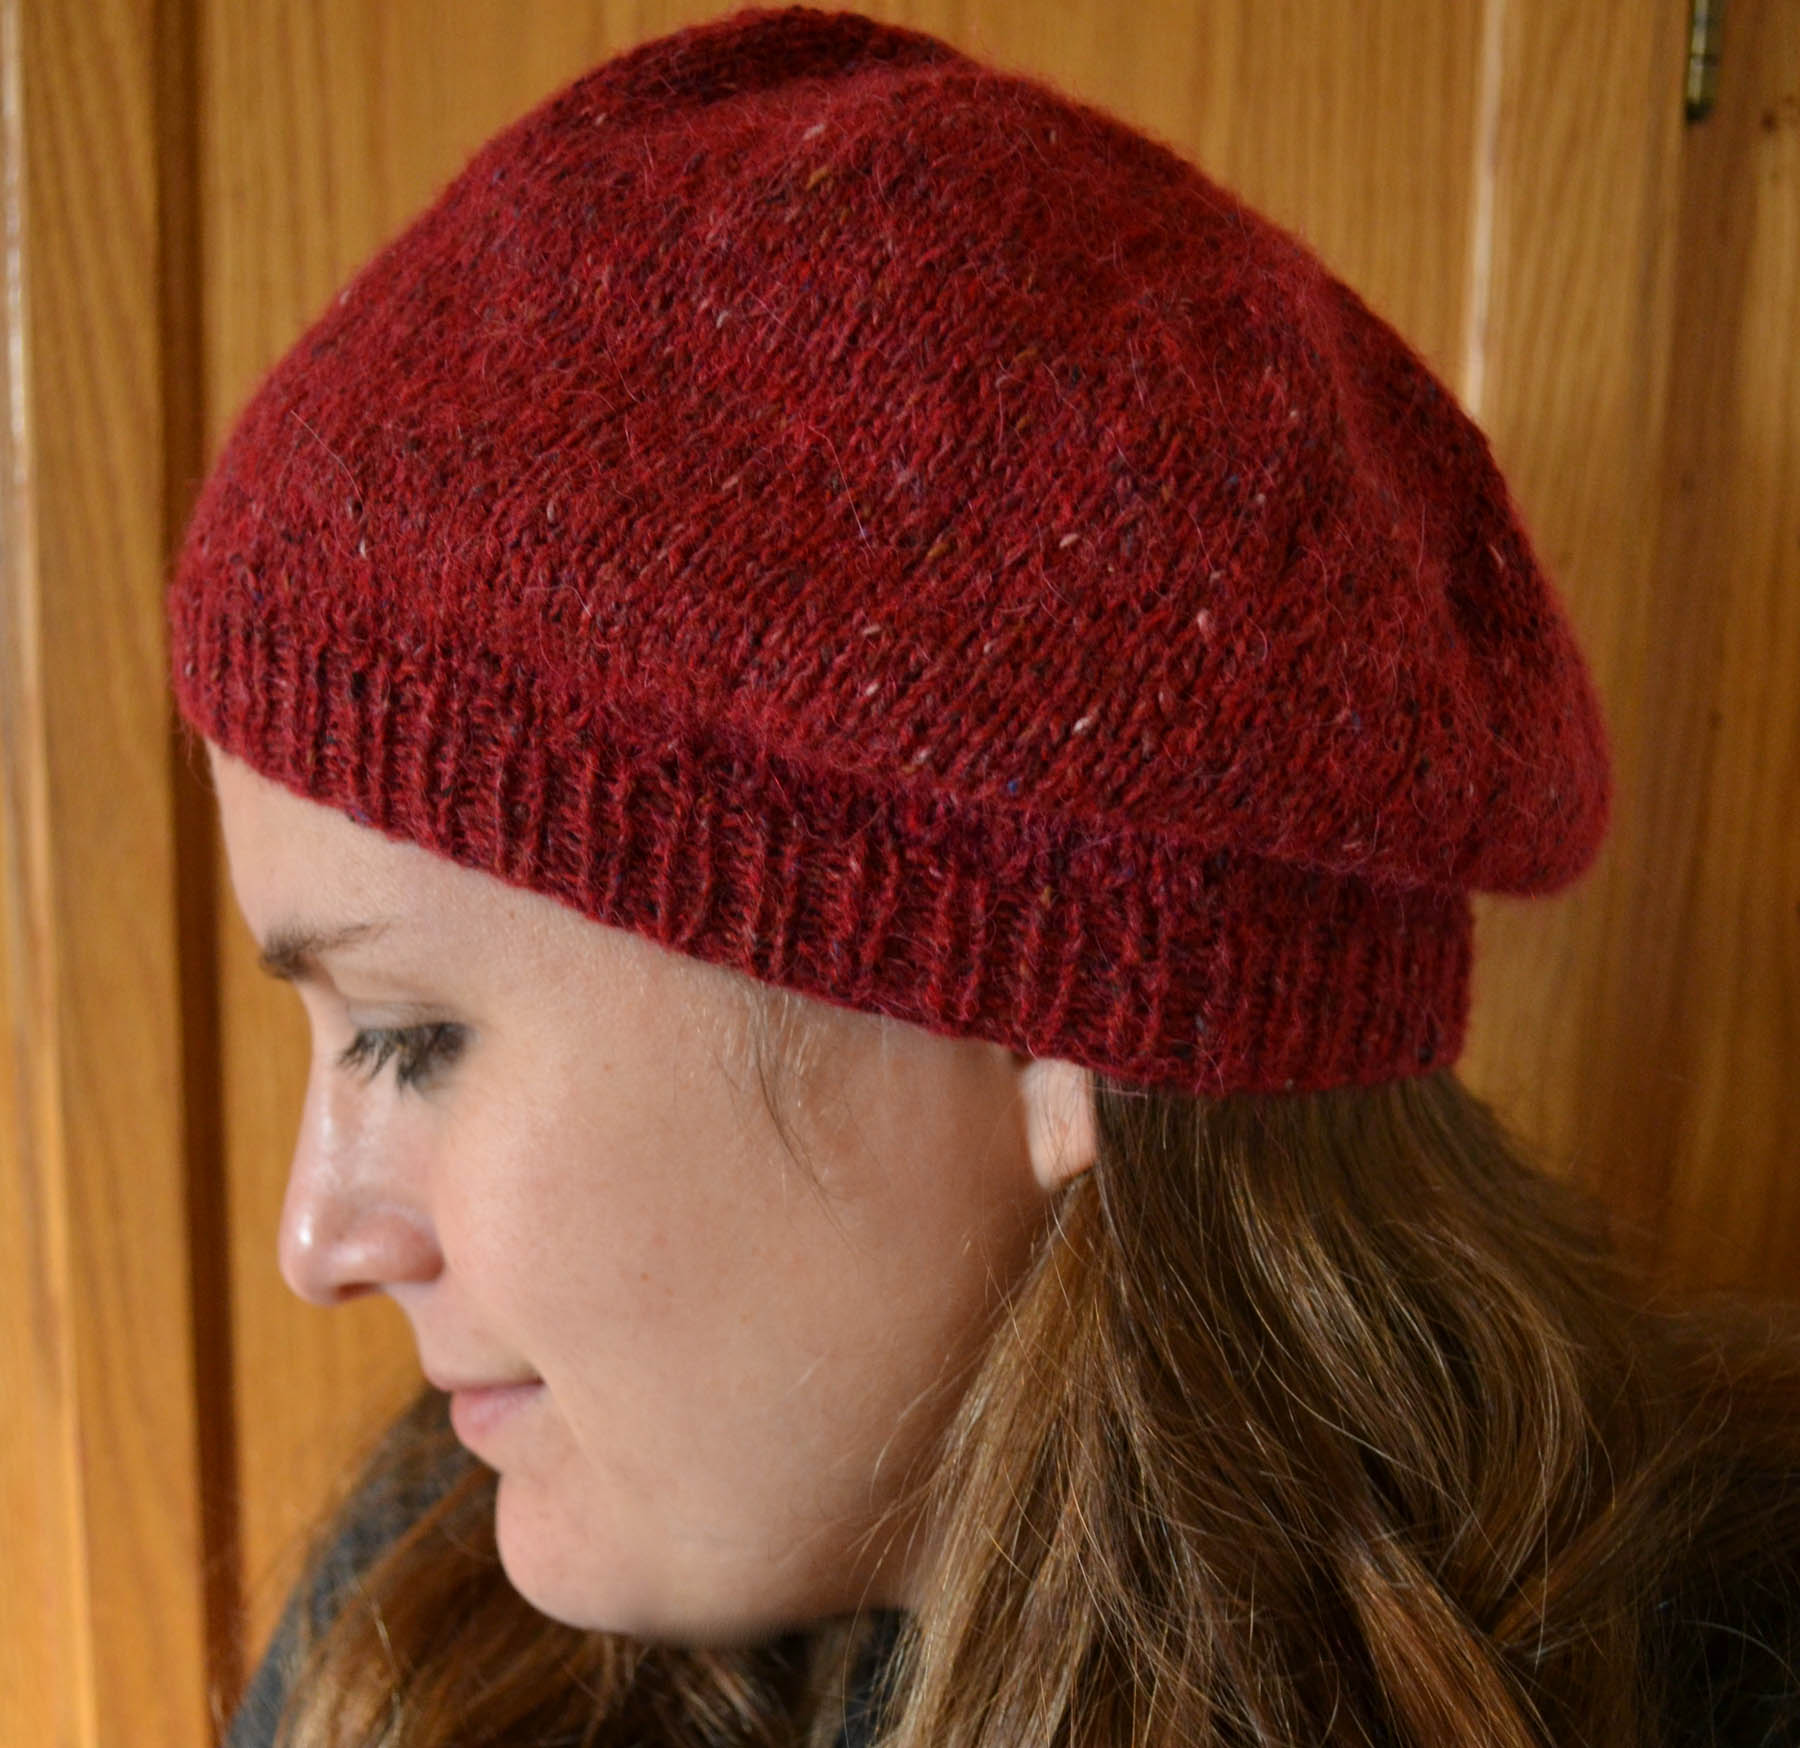 Felted Tweed + Simple Beret = Ab Fab, Darling. – knittingsarah